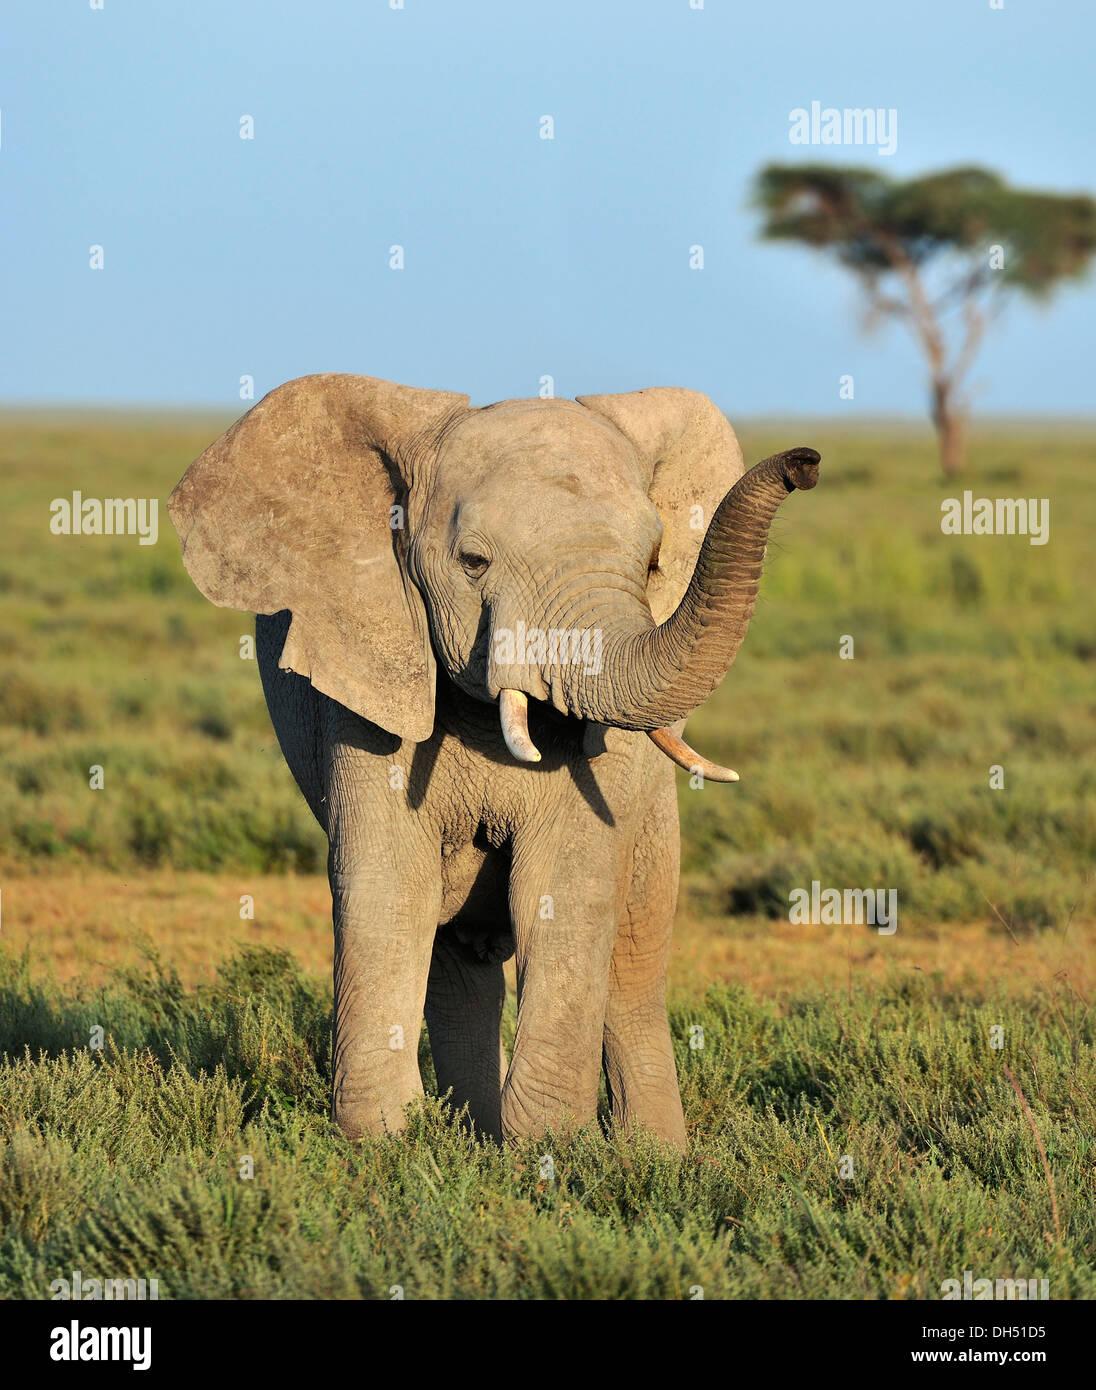 Young African Bush Elephant (Loxodonta africana) in the savannah landscape, Serengeti, Tanzania - Stock Image